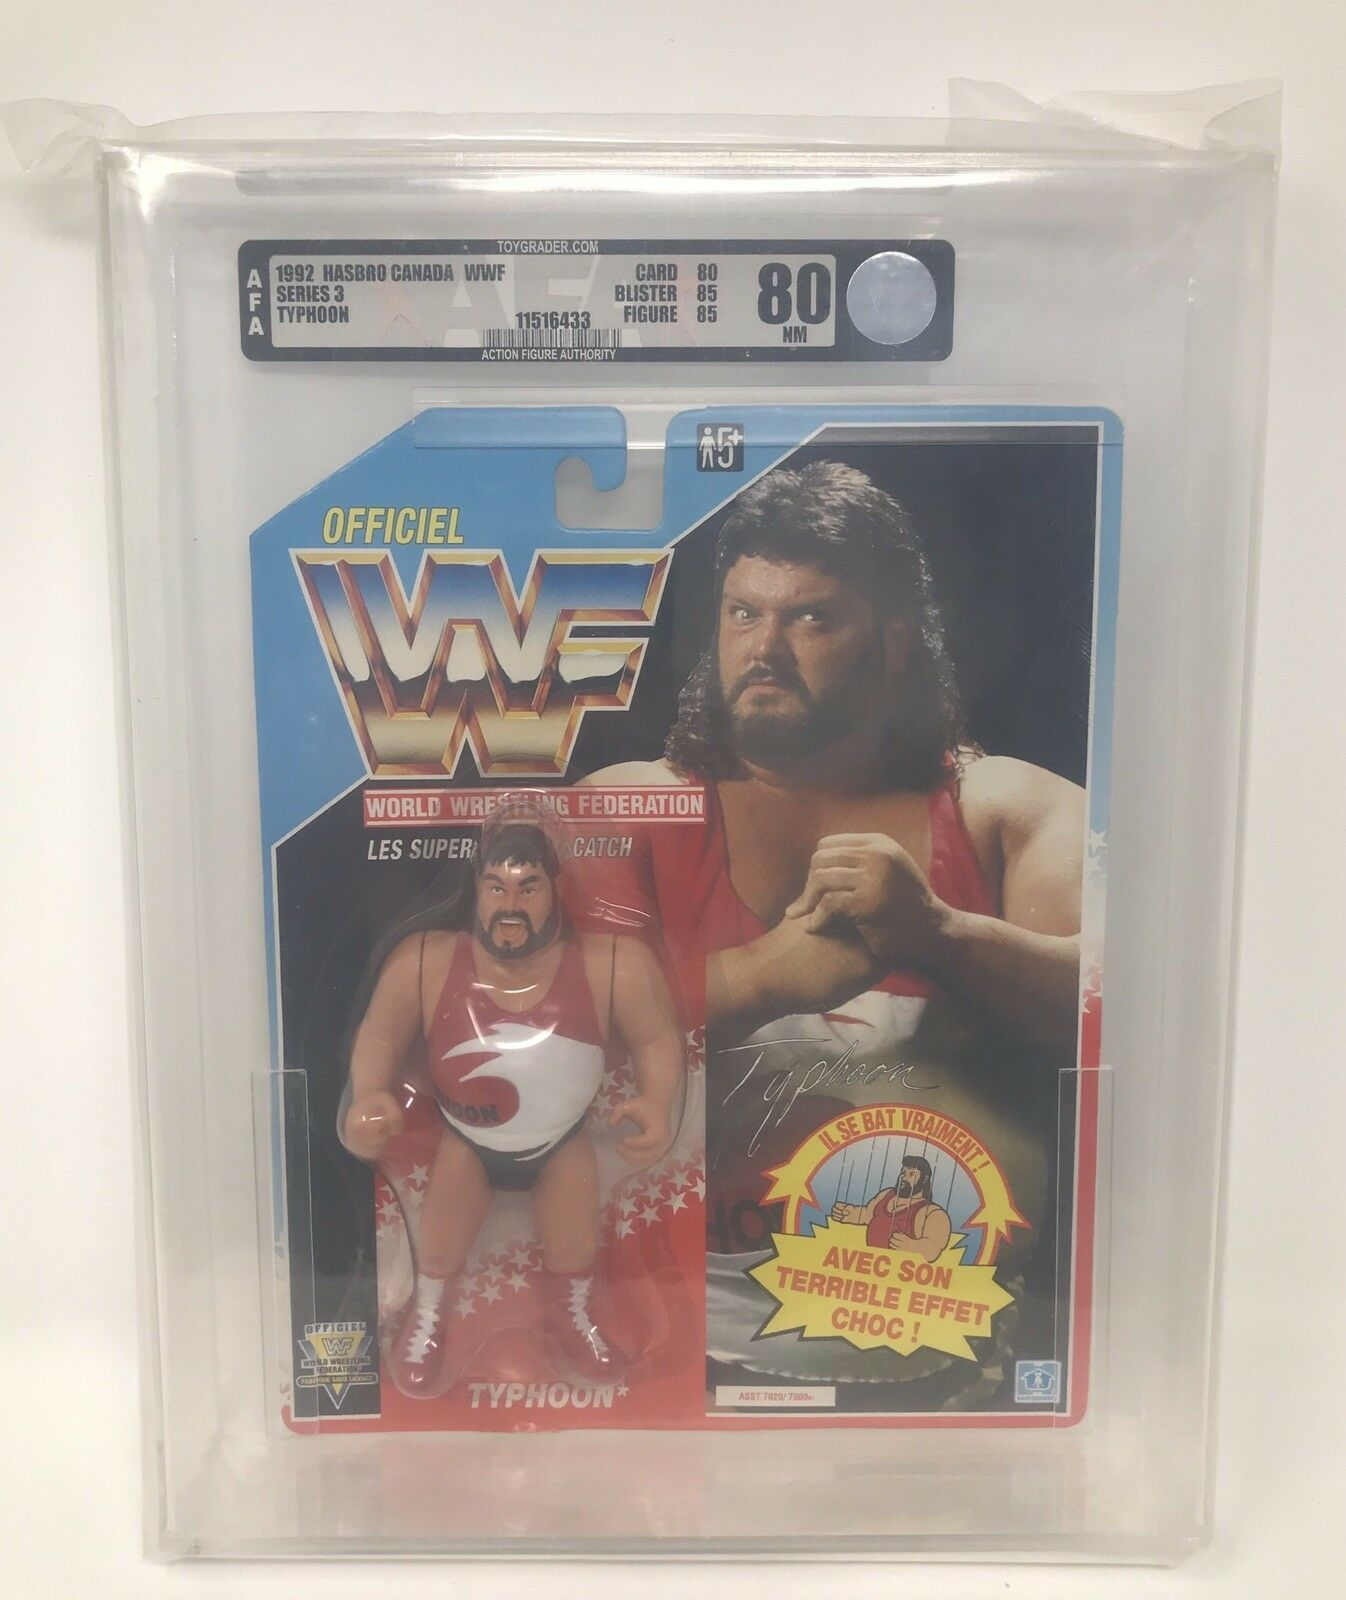 TYPHOON 1992 Series 3 HASBRO WWF Wrestling FIGURE Fred Ottman Tugboat WWE AFA 80